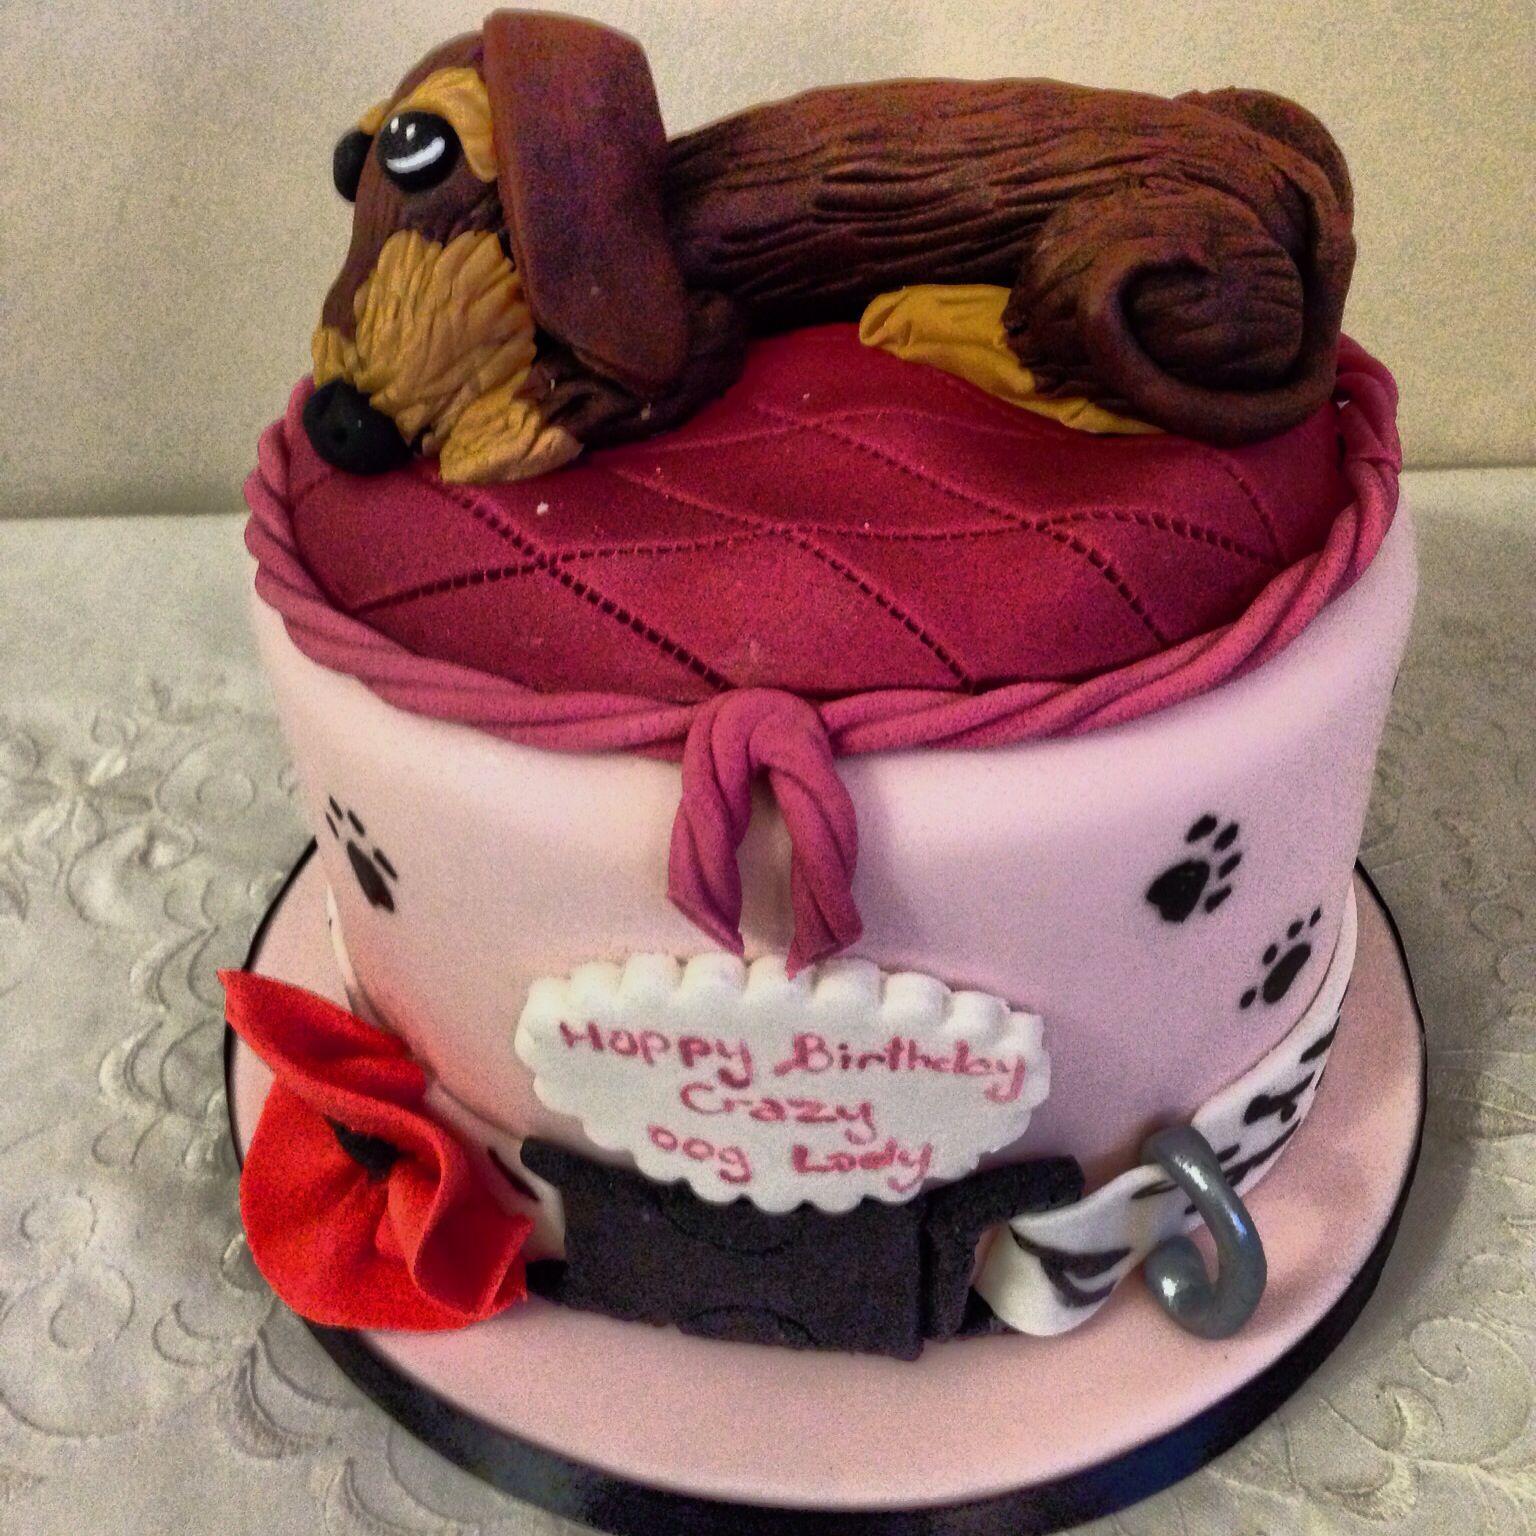 Sausage Dog Cake Decorations : Pin Sausage Dog By Helen Ward Cakesdecorcom Cake ...